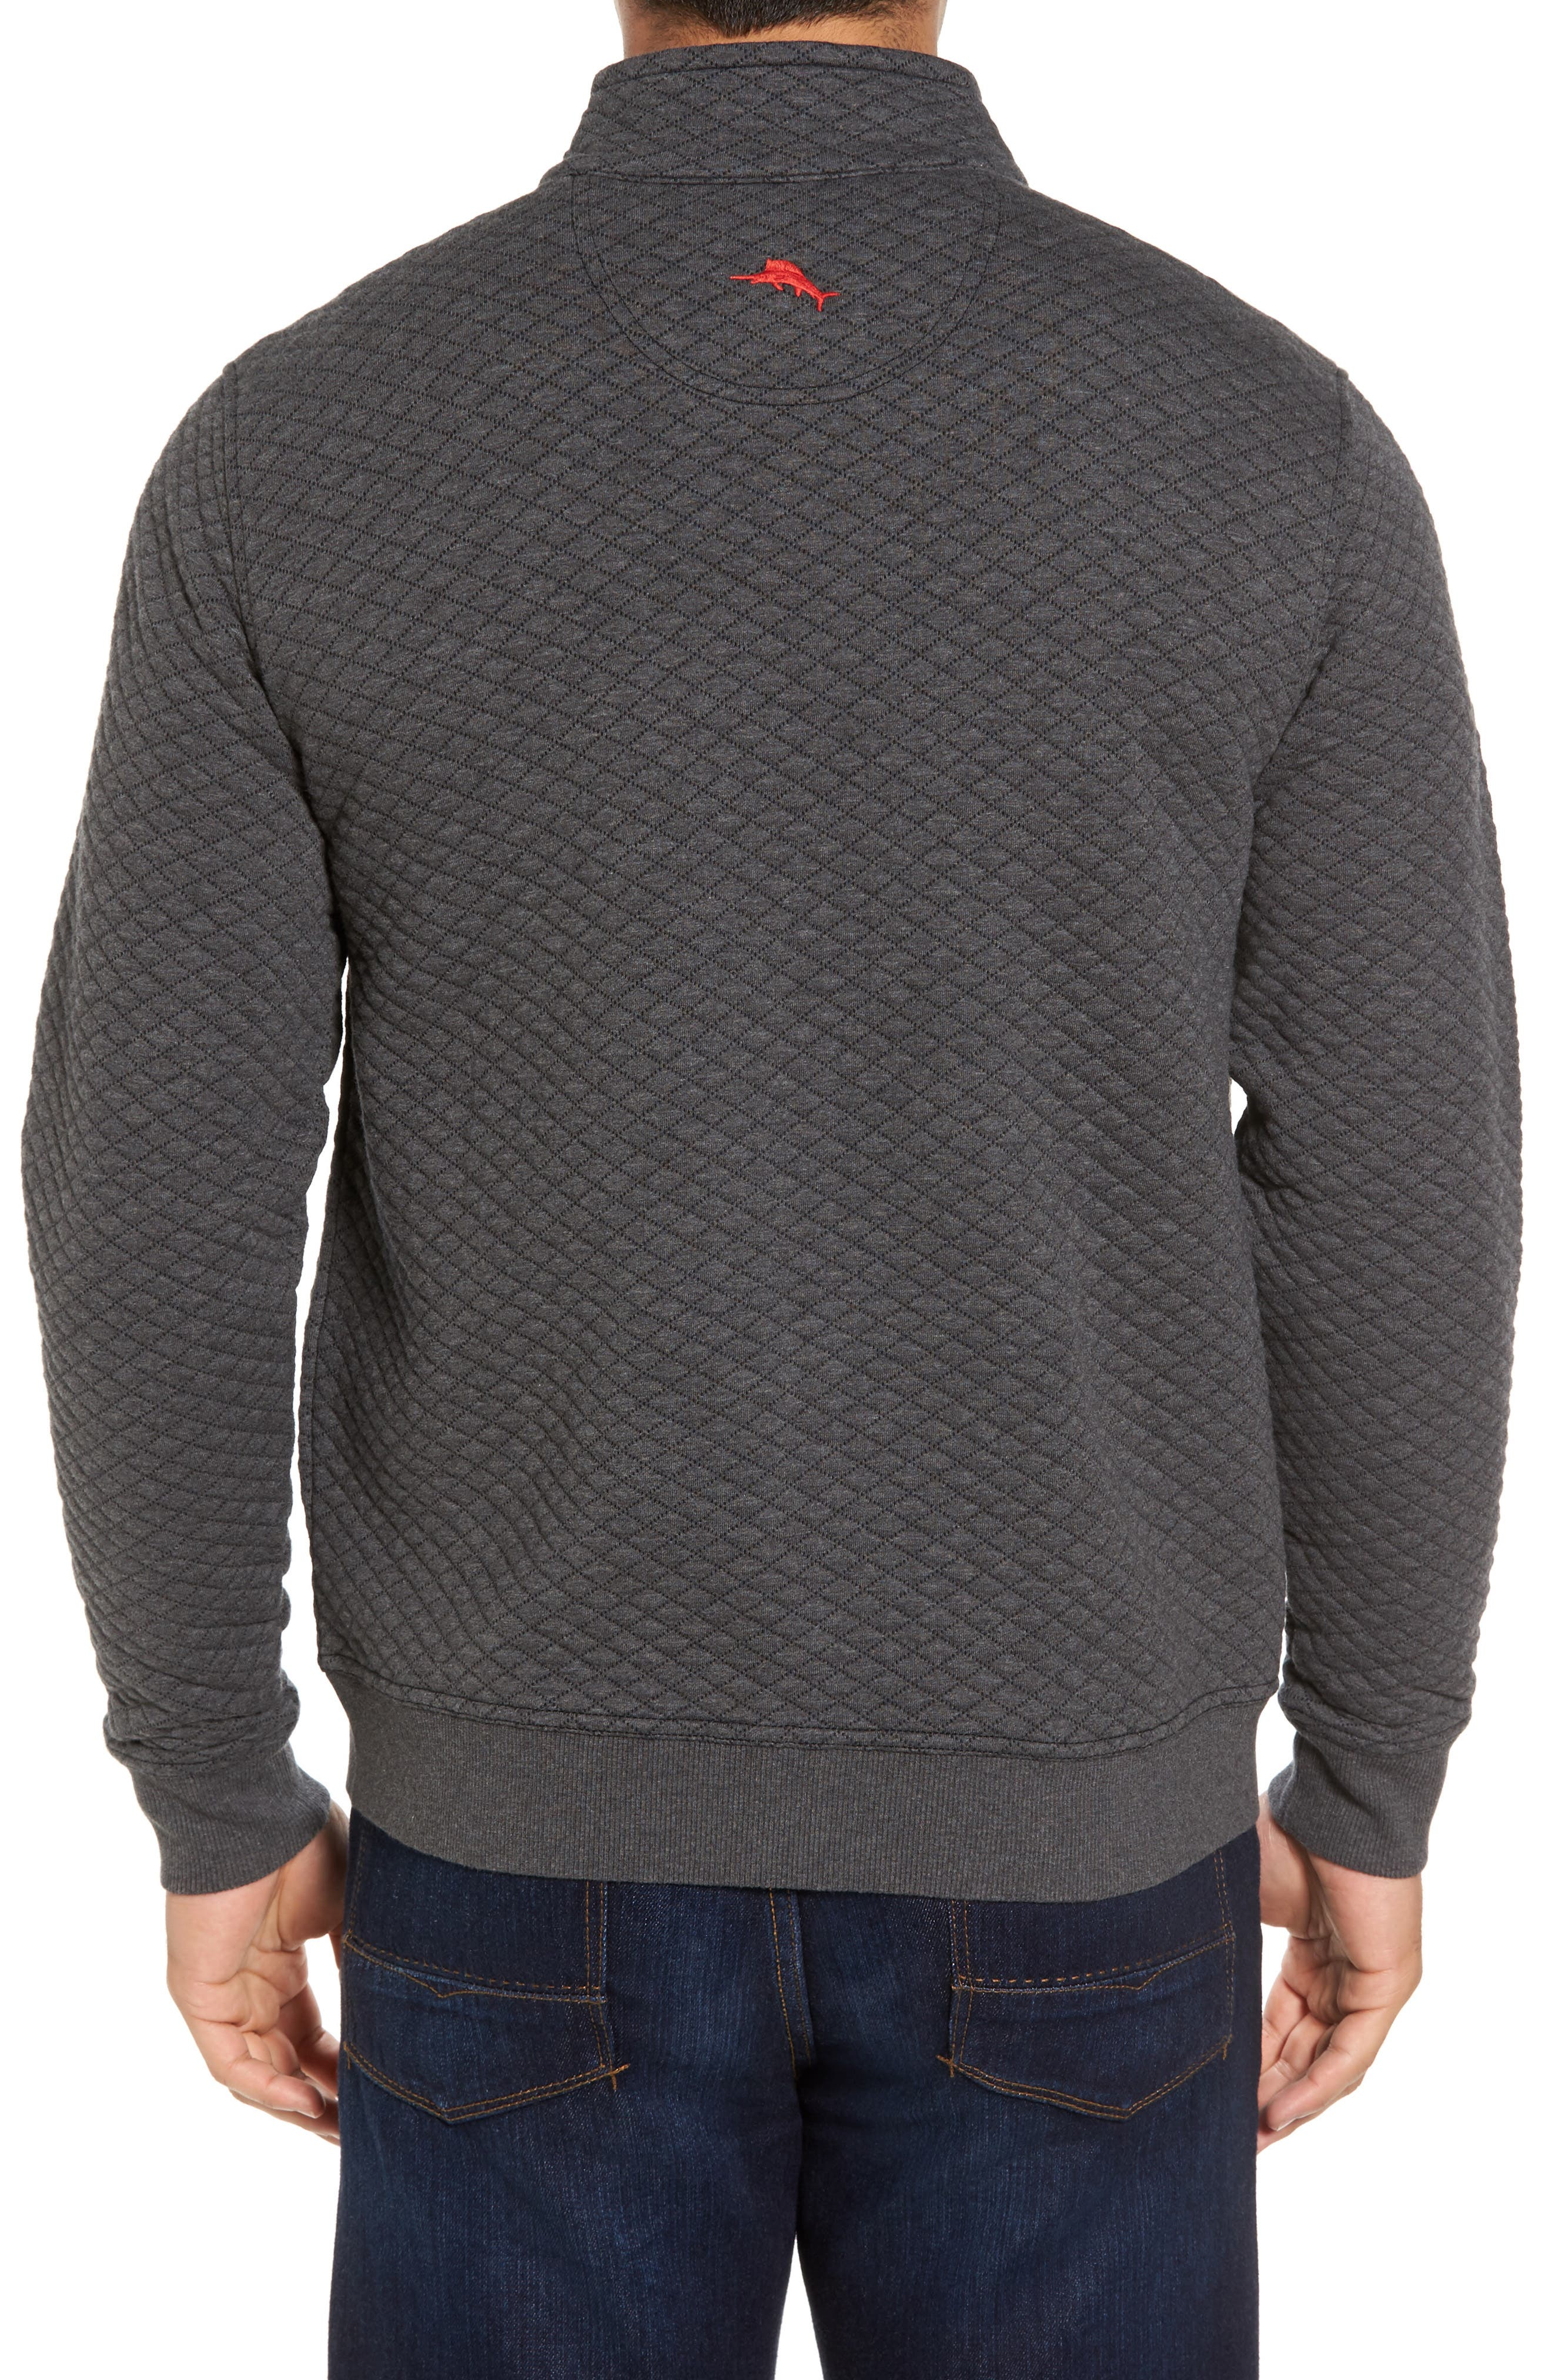 NFL Quiltessential Full Zip Sweatshirt,                             Alternate thumbnail 2, color,                             020